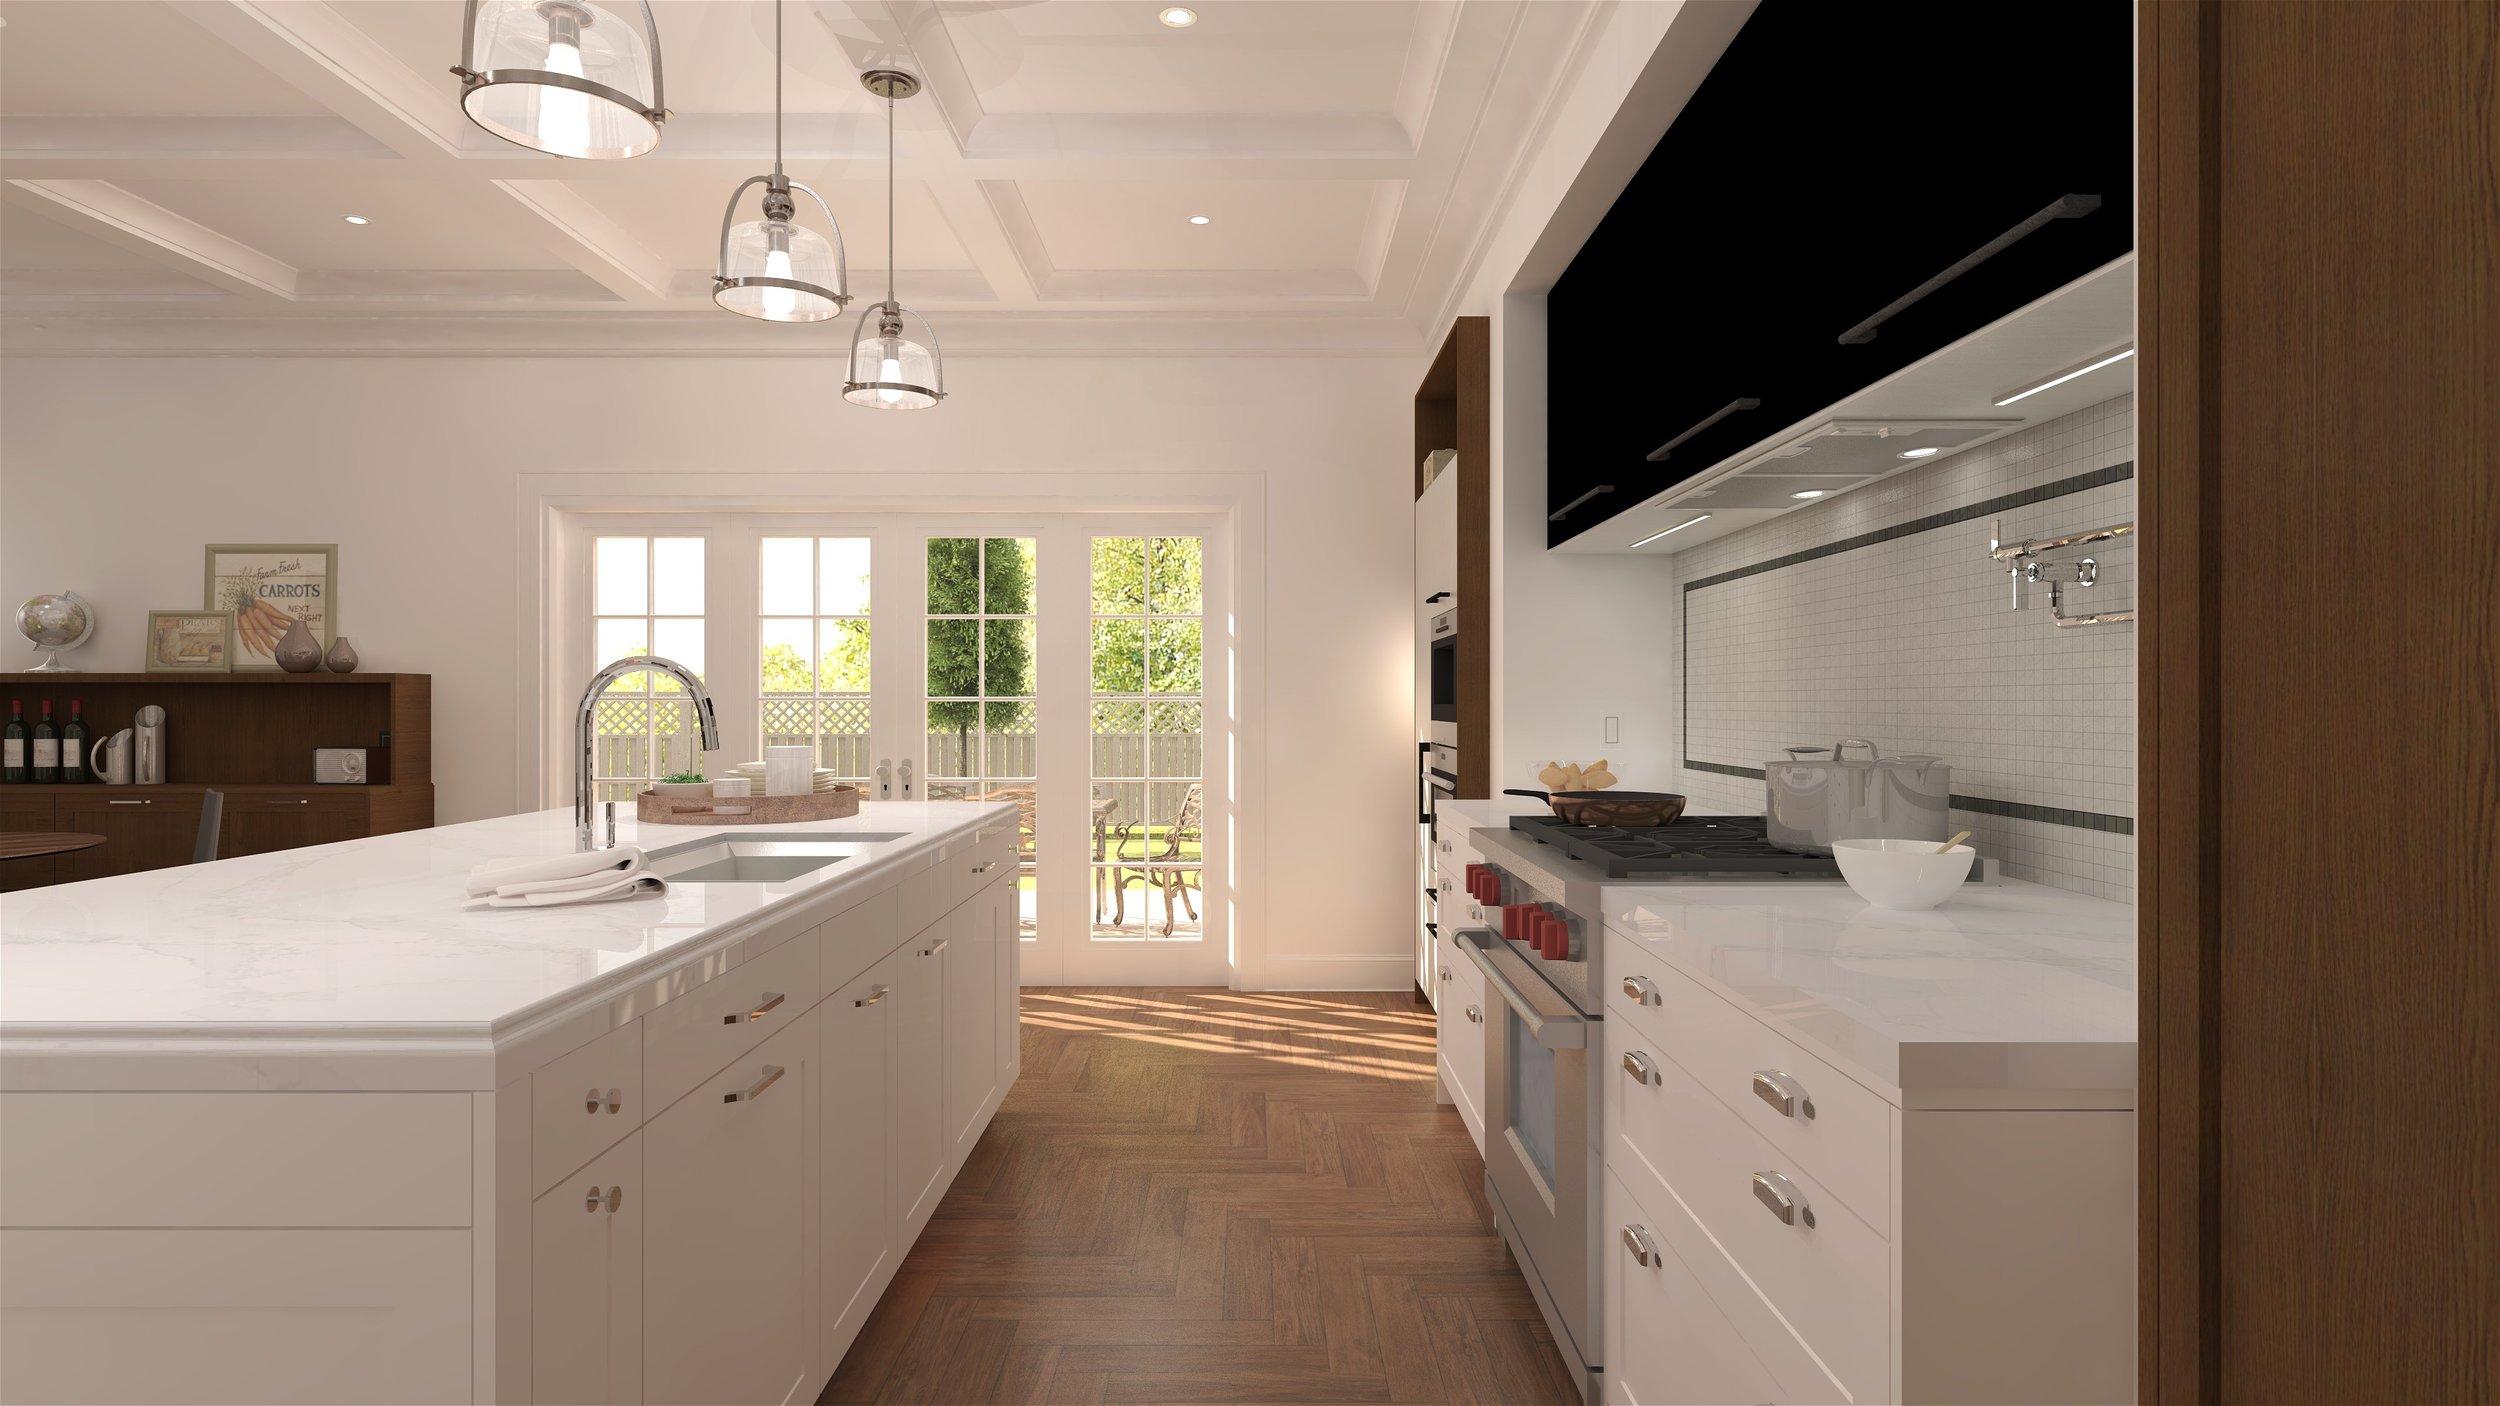 deSousaDESIGN_Kitchen_New_Vintage_V1f_3840x2160.jpg